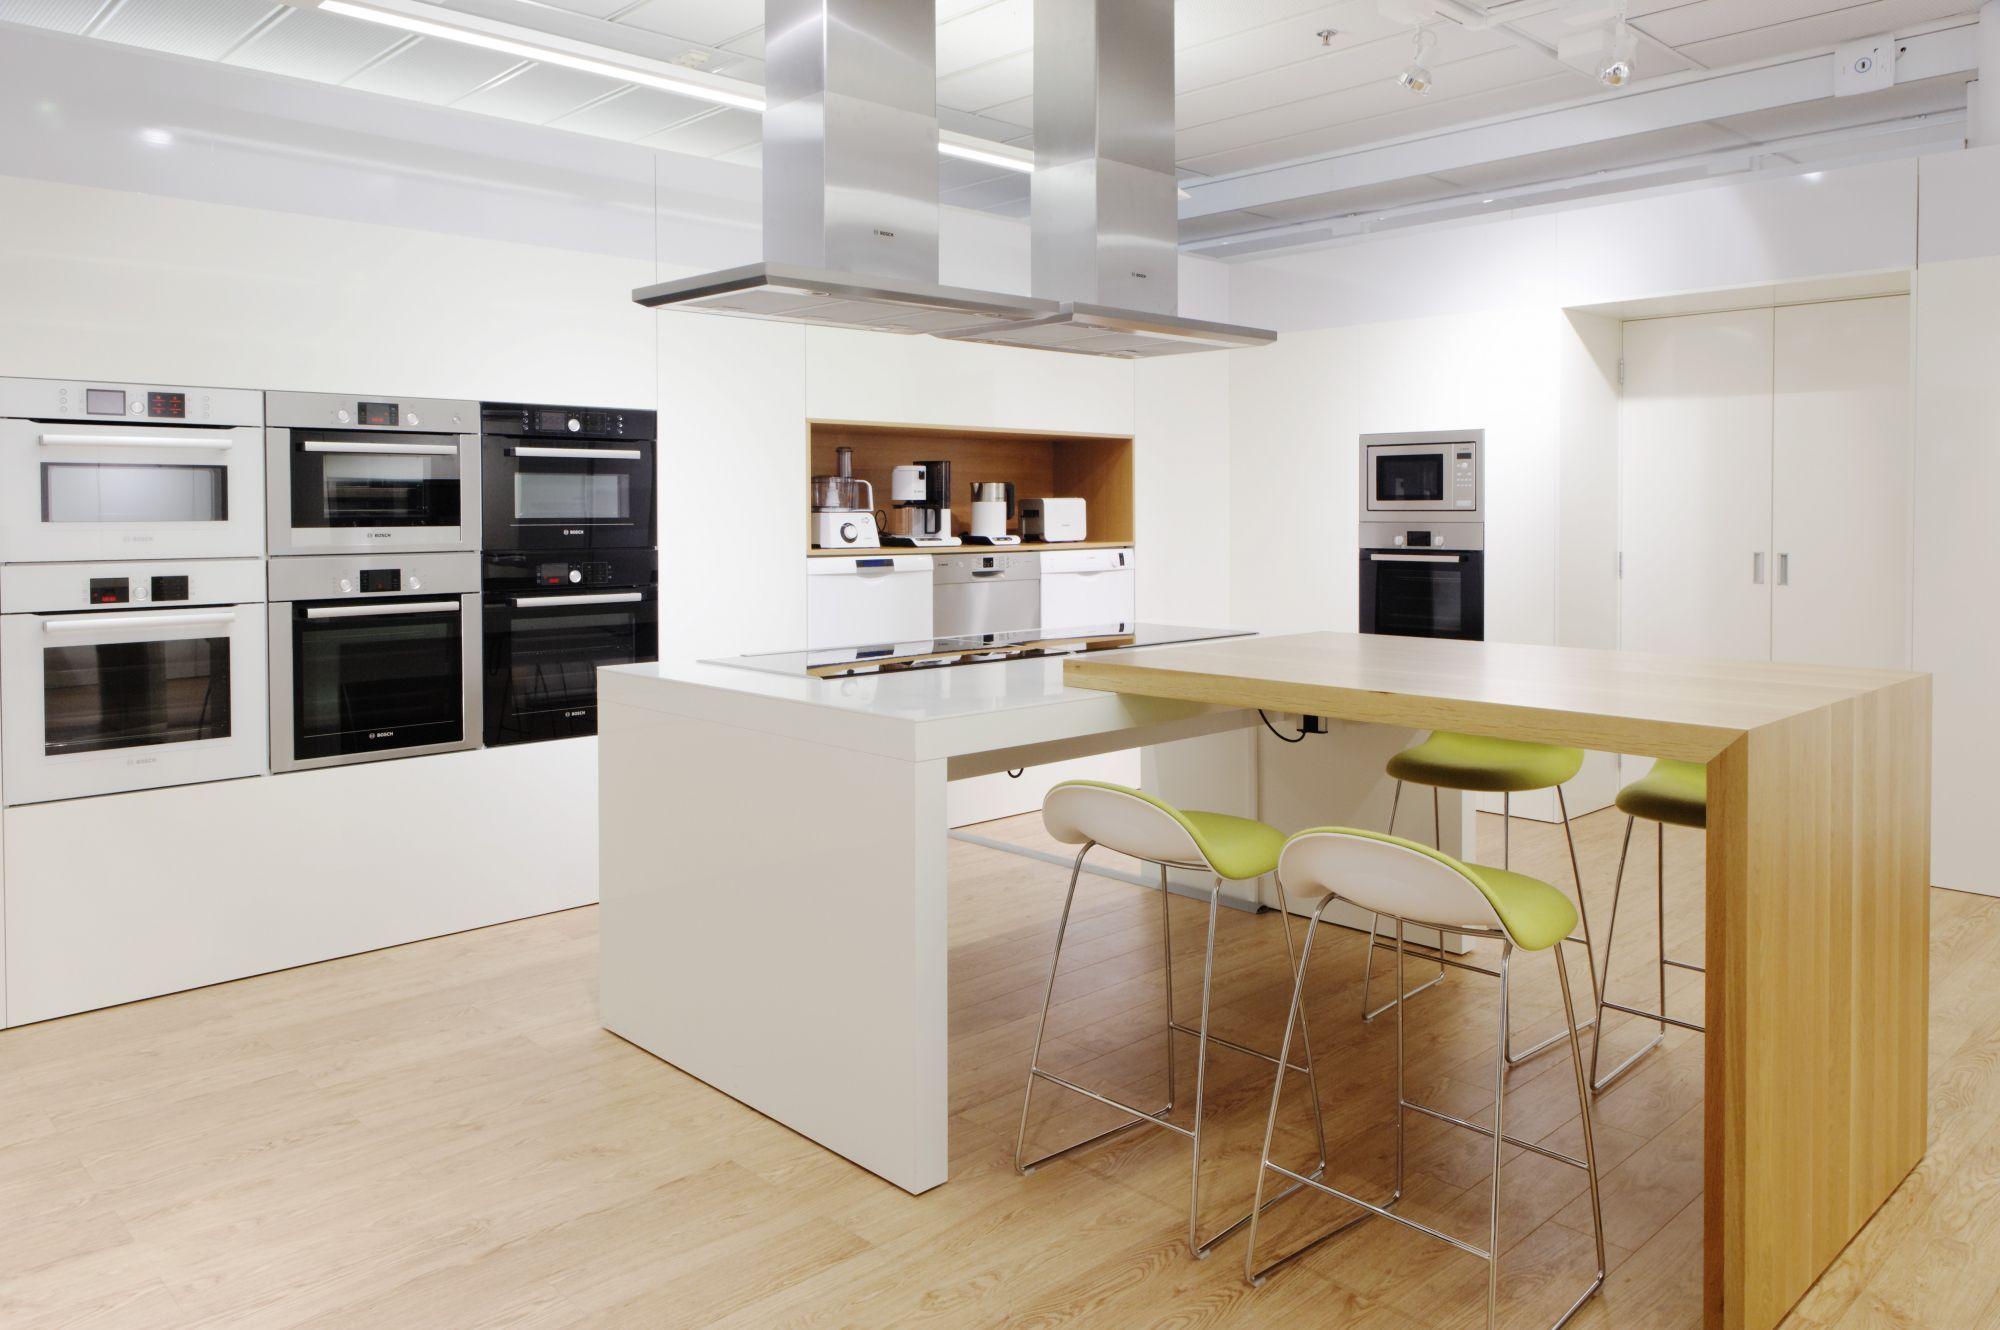 bosch appliance showroom - Google Search | 形象 | Pinterest ...